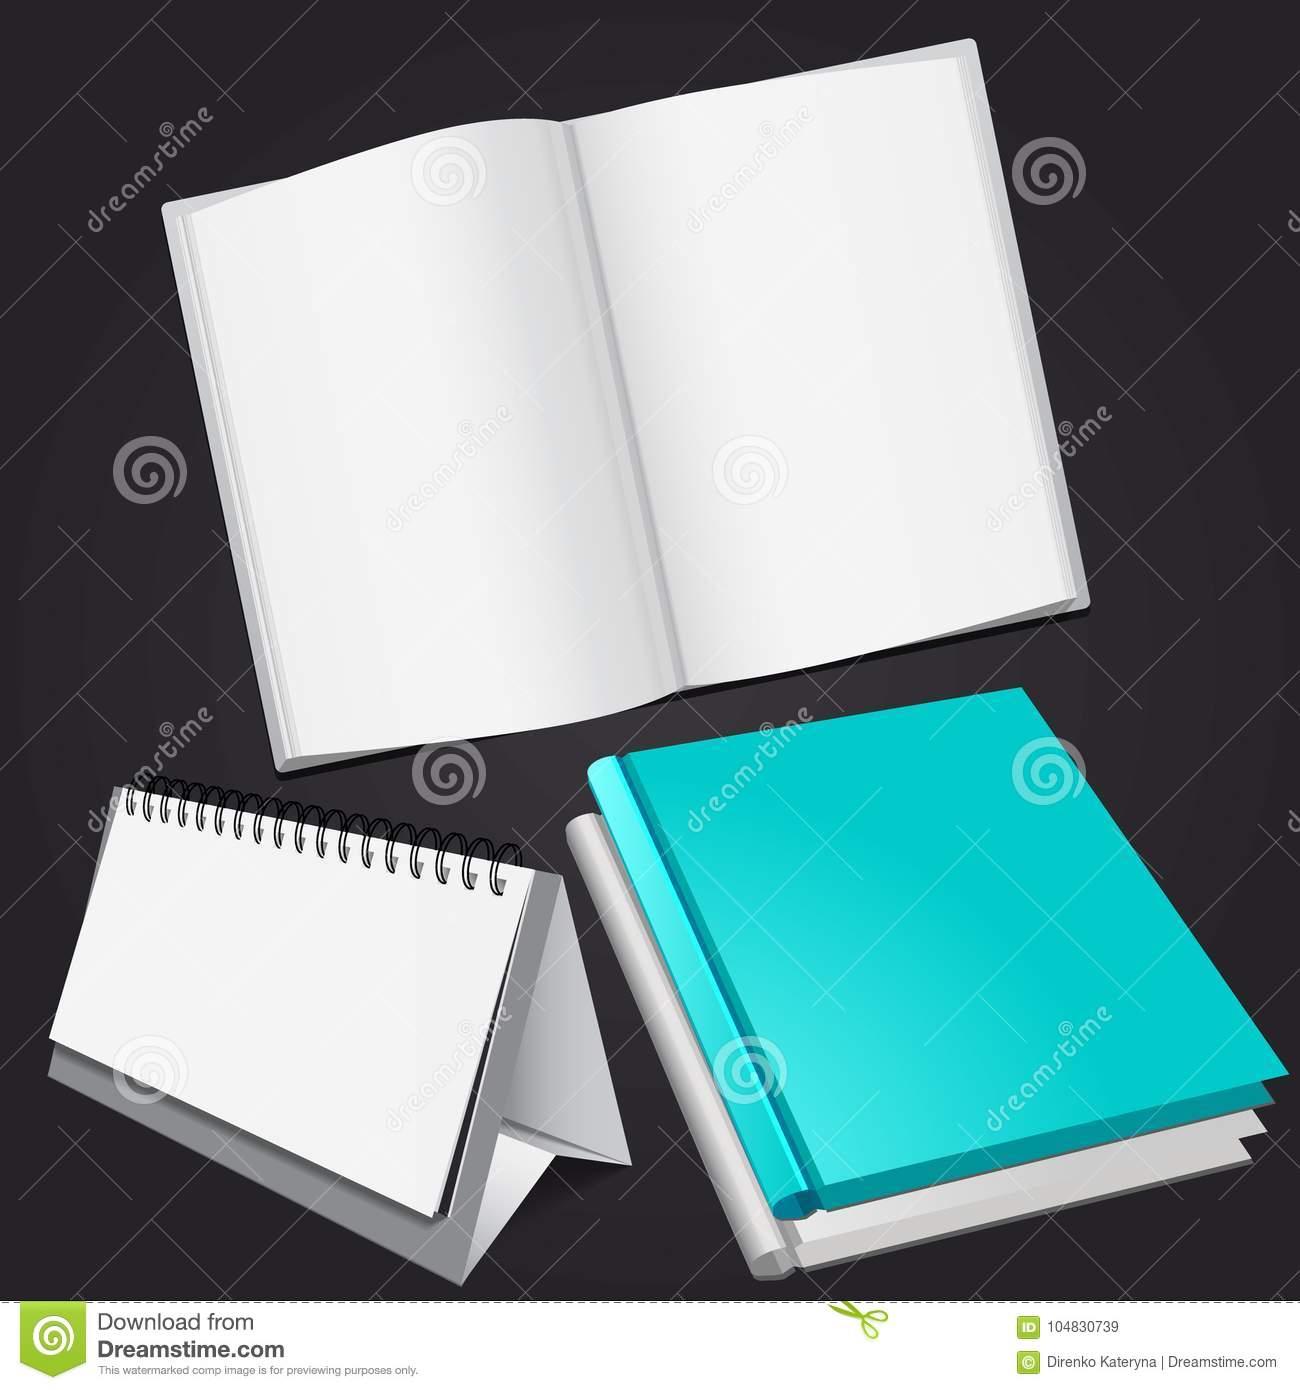 Set Of Blank Magazine, Album Or Book And Desktop Calendar Mockup On